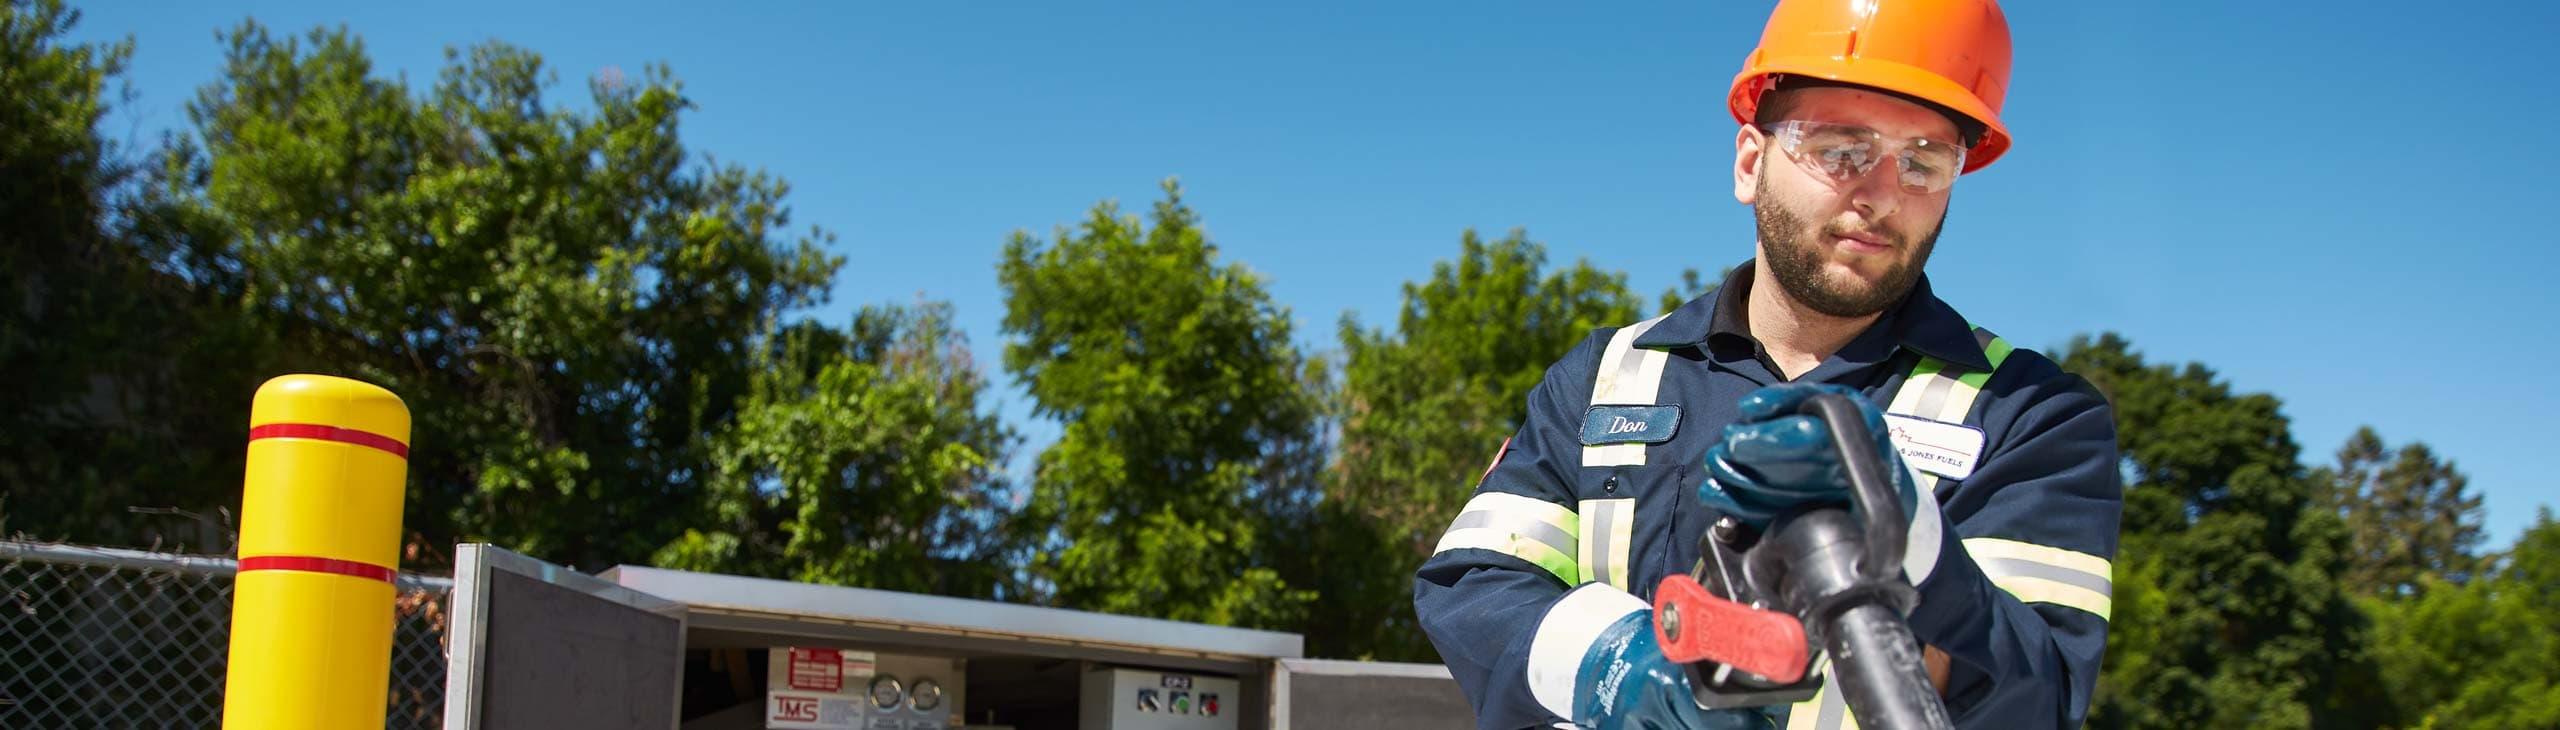 Un technicien qui livre du carburant en vrac.